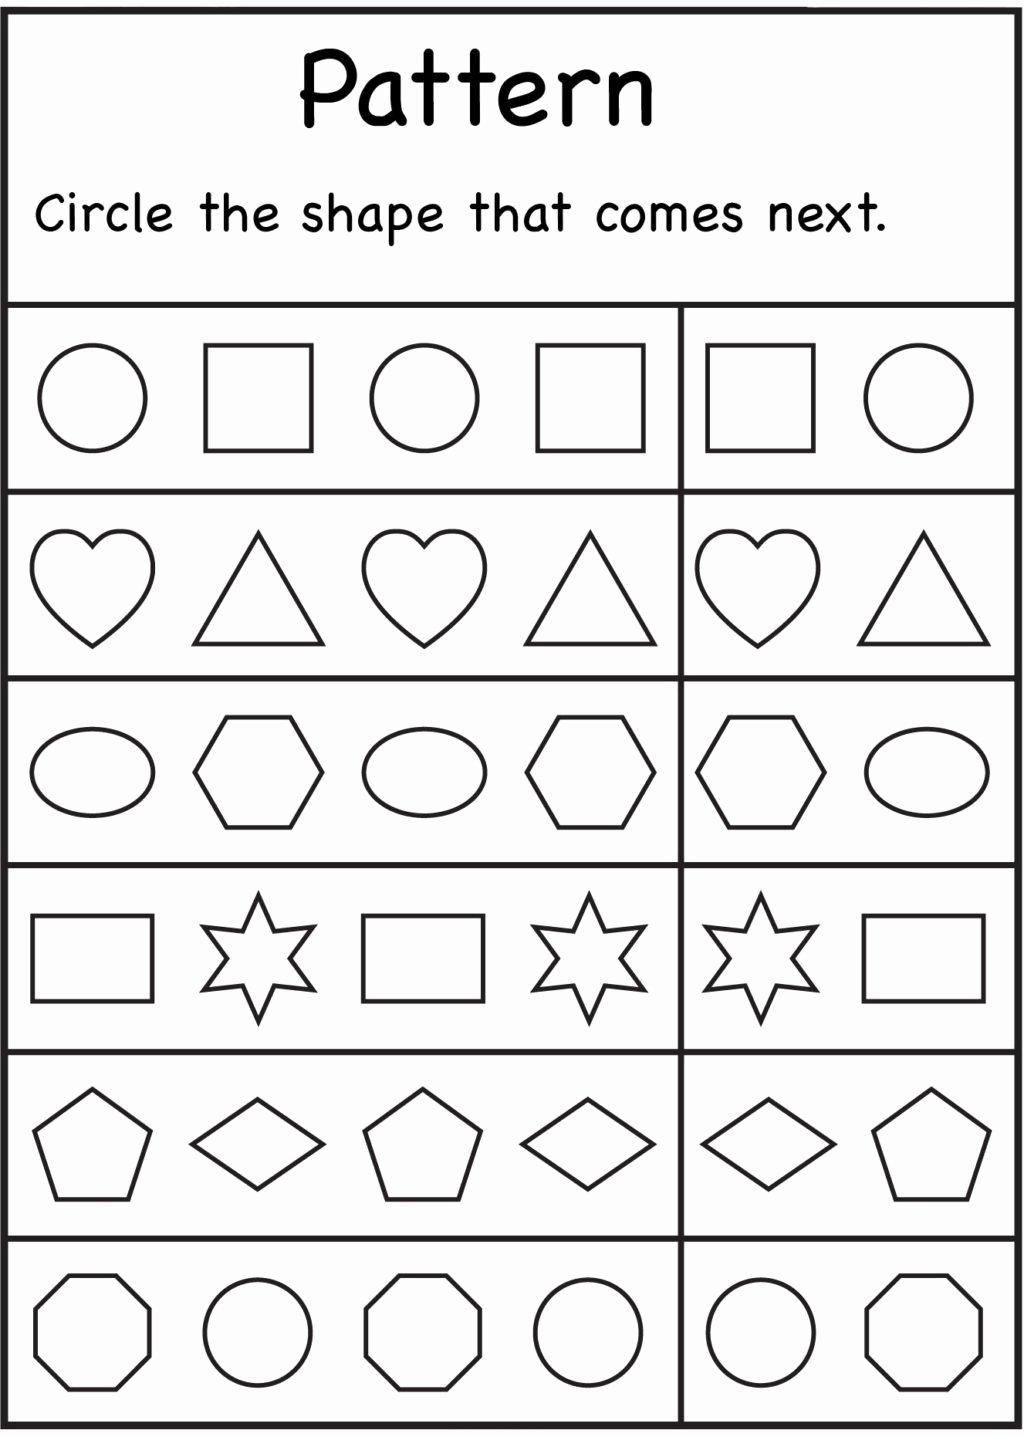 Worksheets for Preschoolers Math Unique Worksheet Kindergarten Worksheets Math Preschool